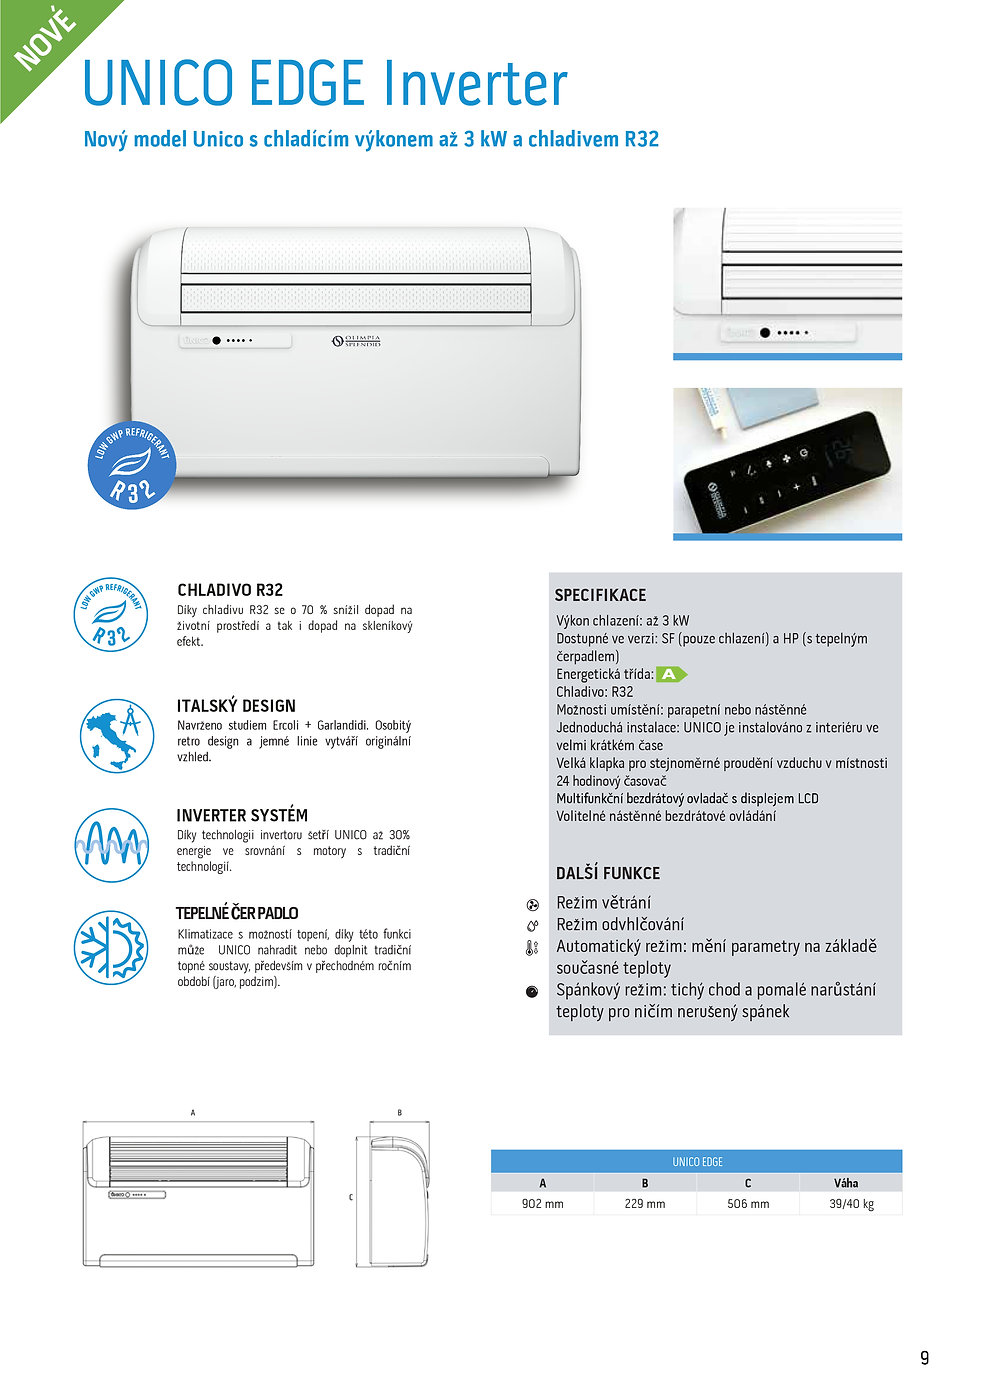 Katalog Unico 2021 Tradesam-11.jpg